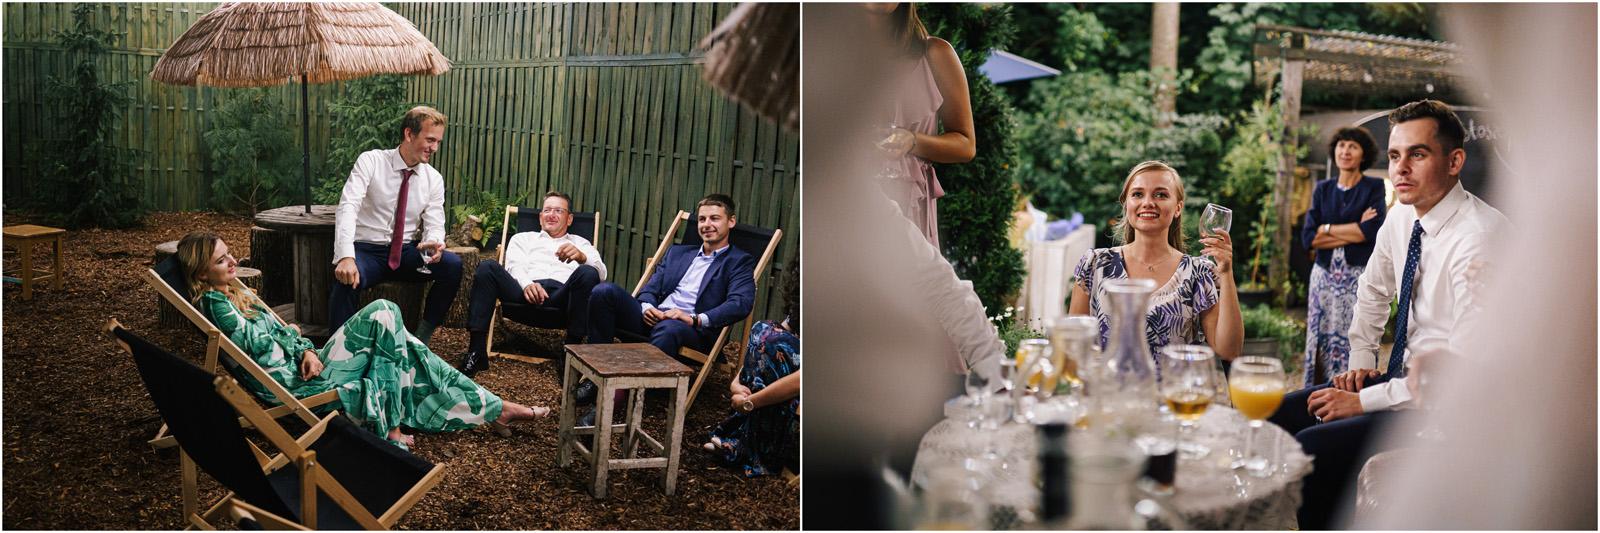 Ania & Mateusz | boho wesele w Stodole pod Kasztanami 132